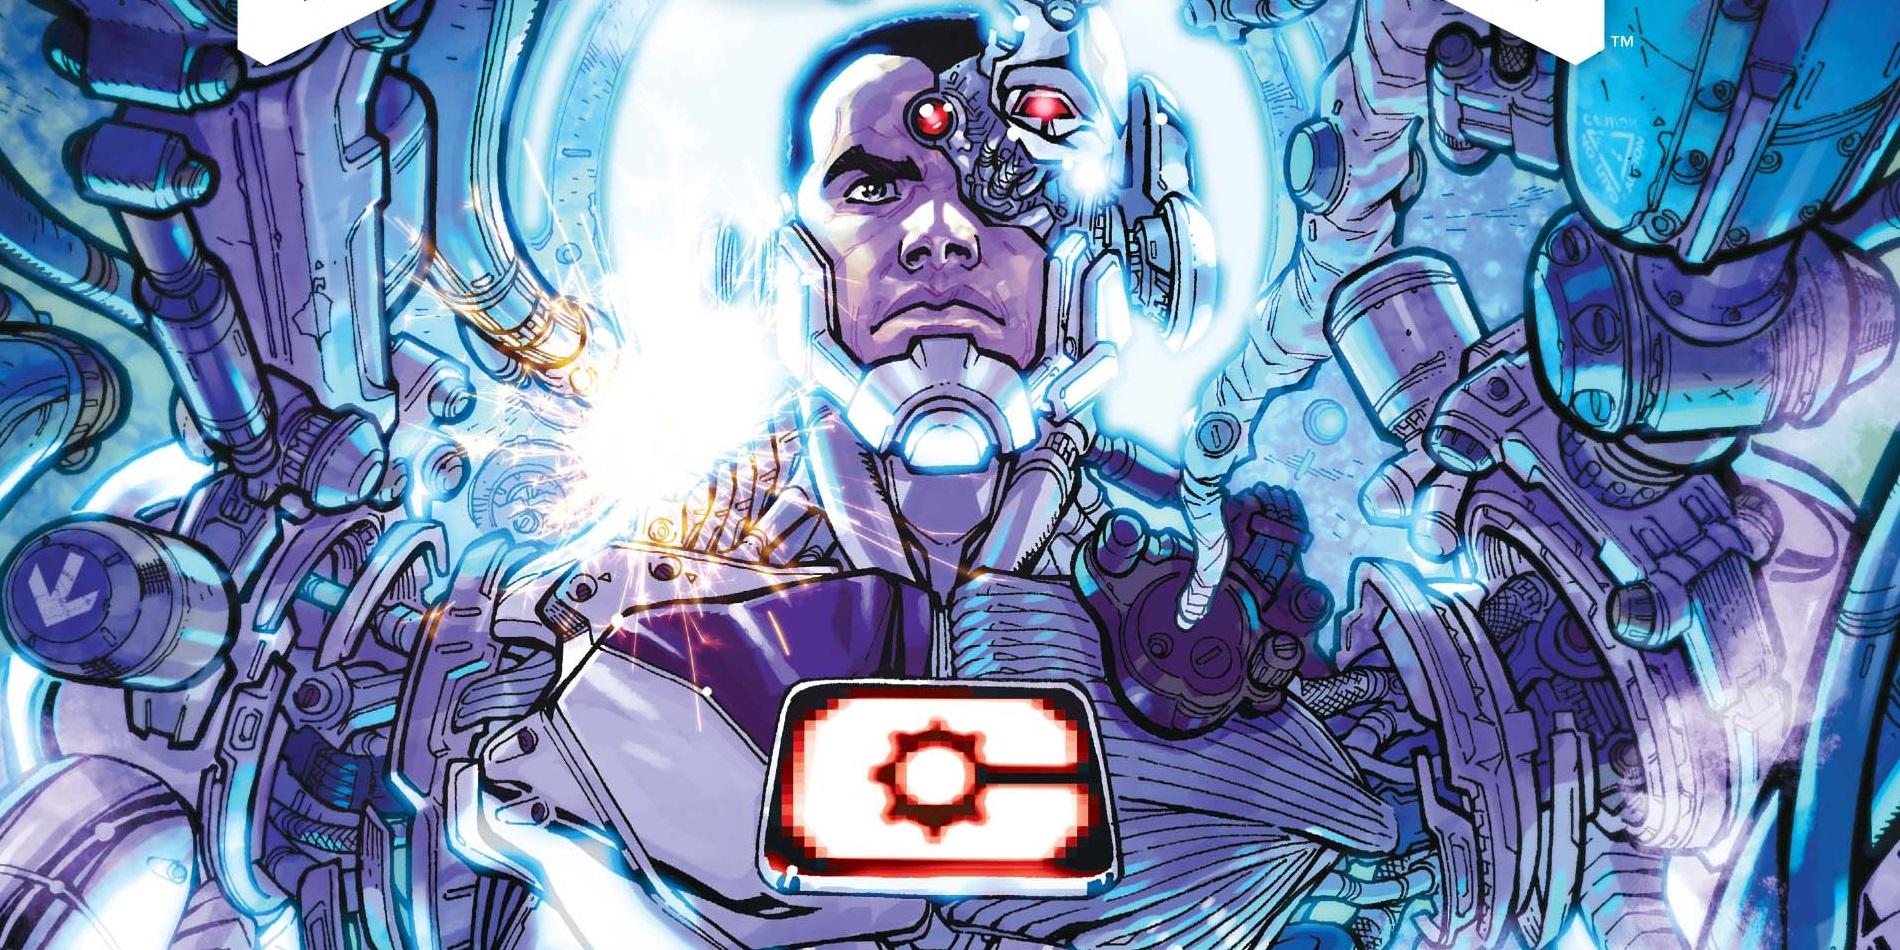 Cyborg Rebirth Origin Alien Purge Justice League: Rebirth Reveals Cyborgs Alien Origins?